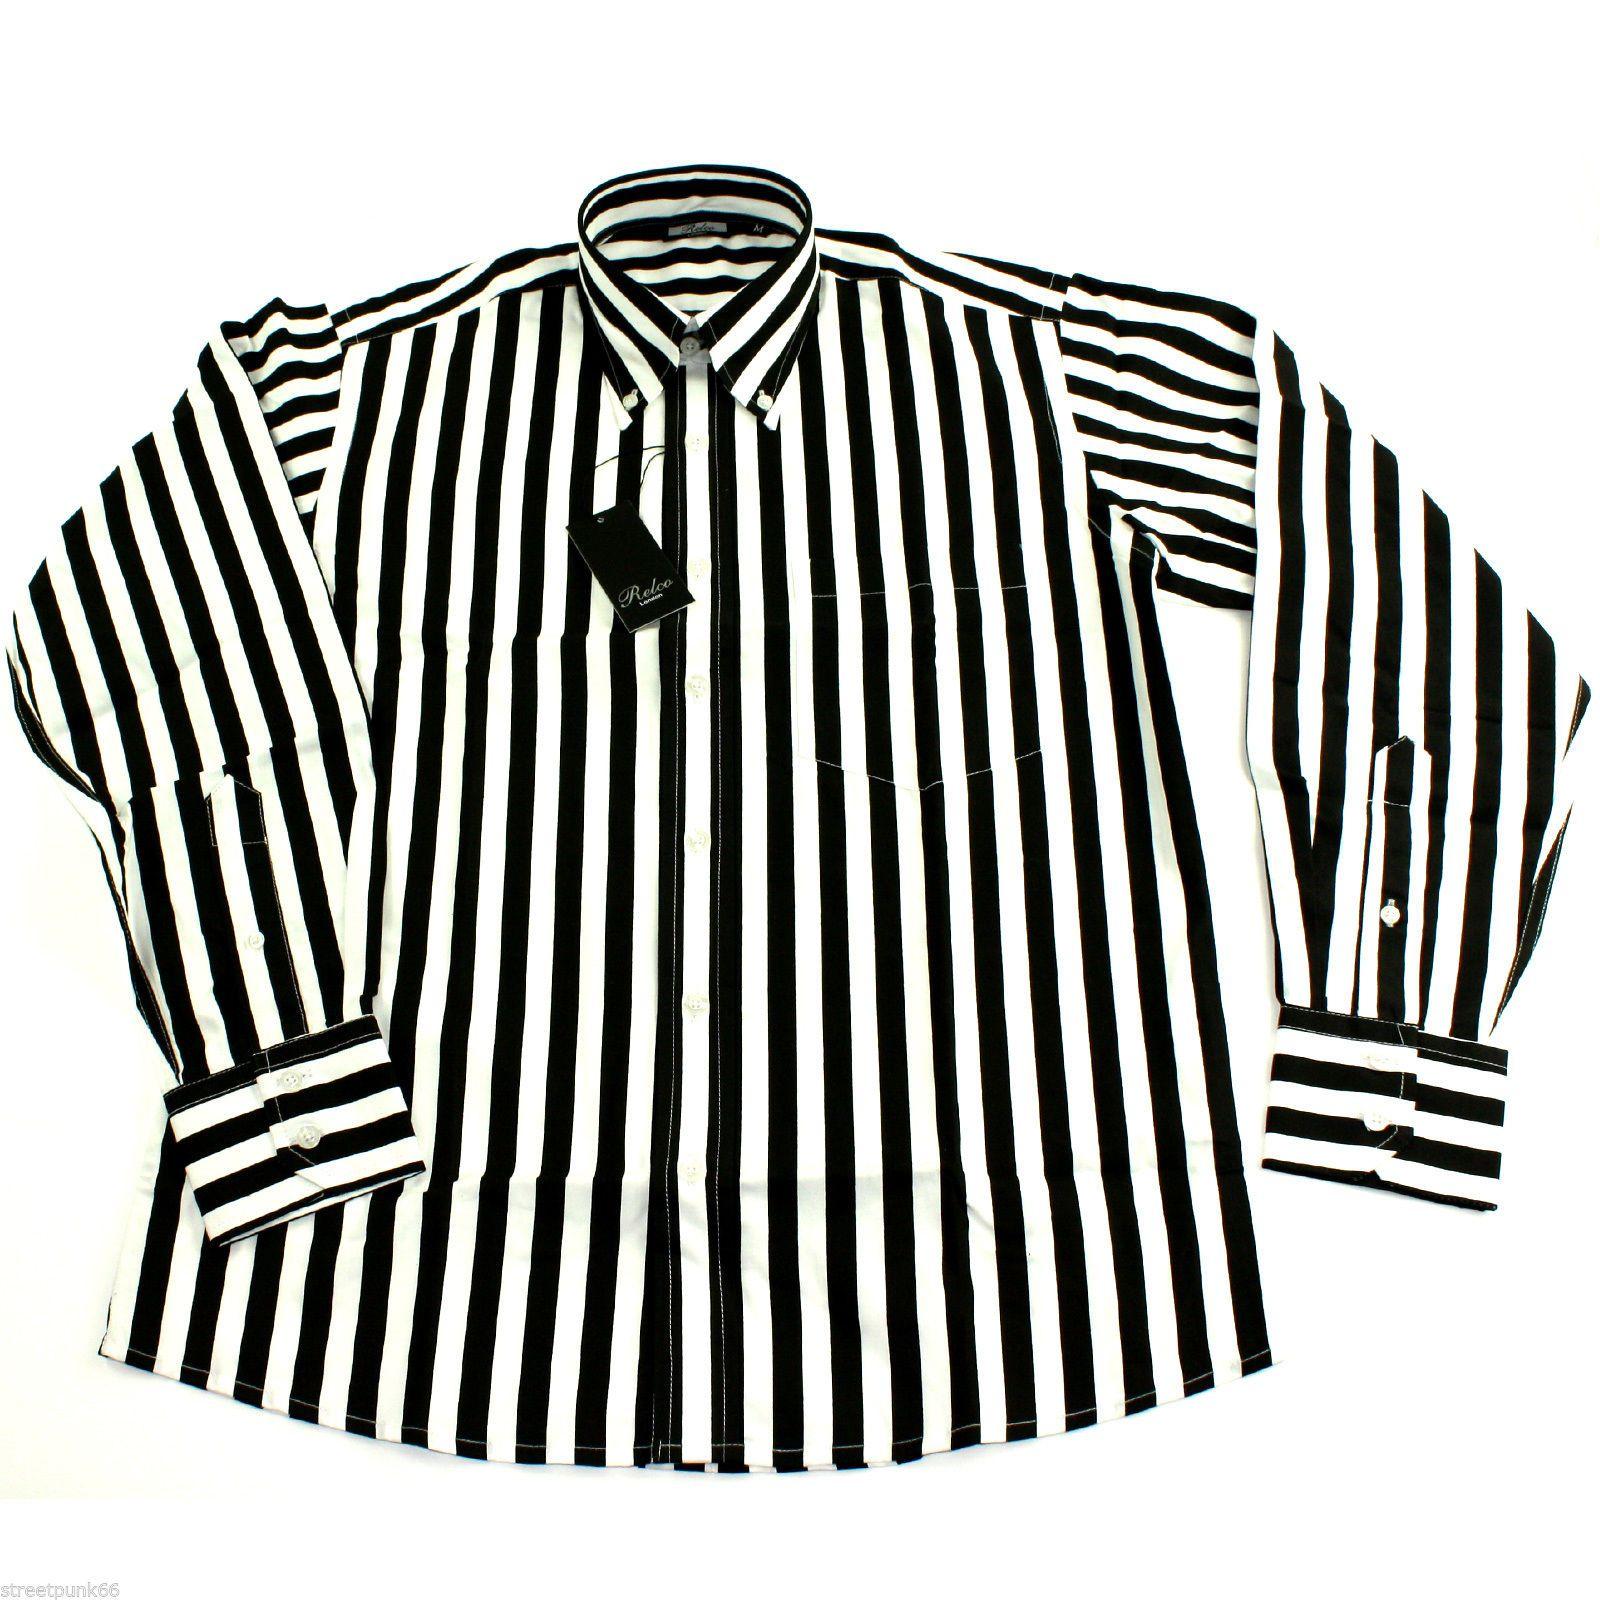 1b71676b Relco Mens Black White Striped Long Sleeved Shirt Mod Skin Retro Indie 60s